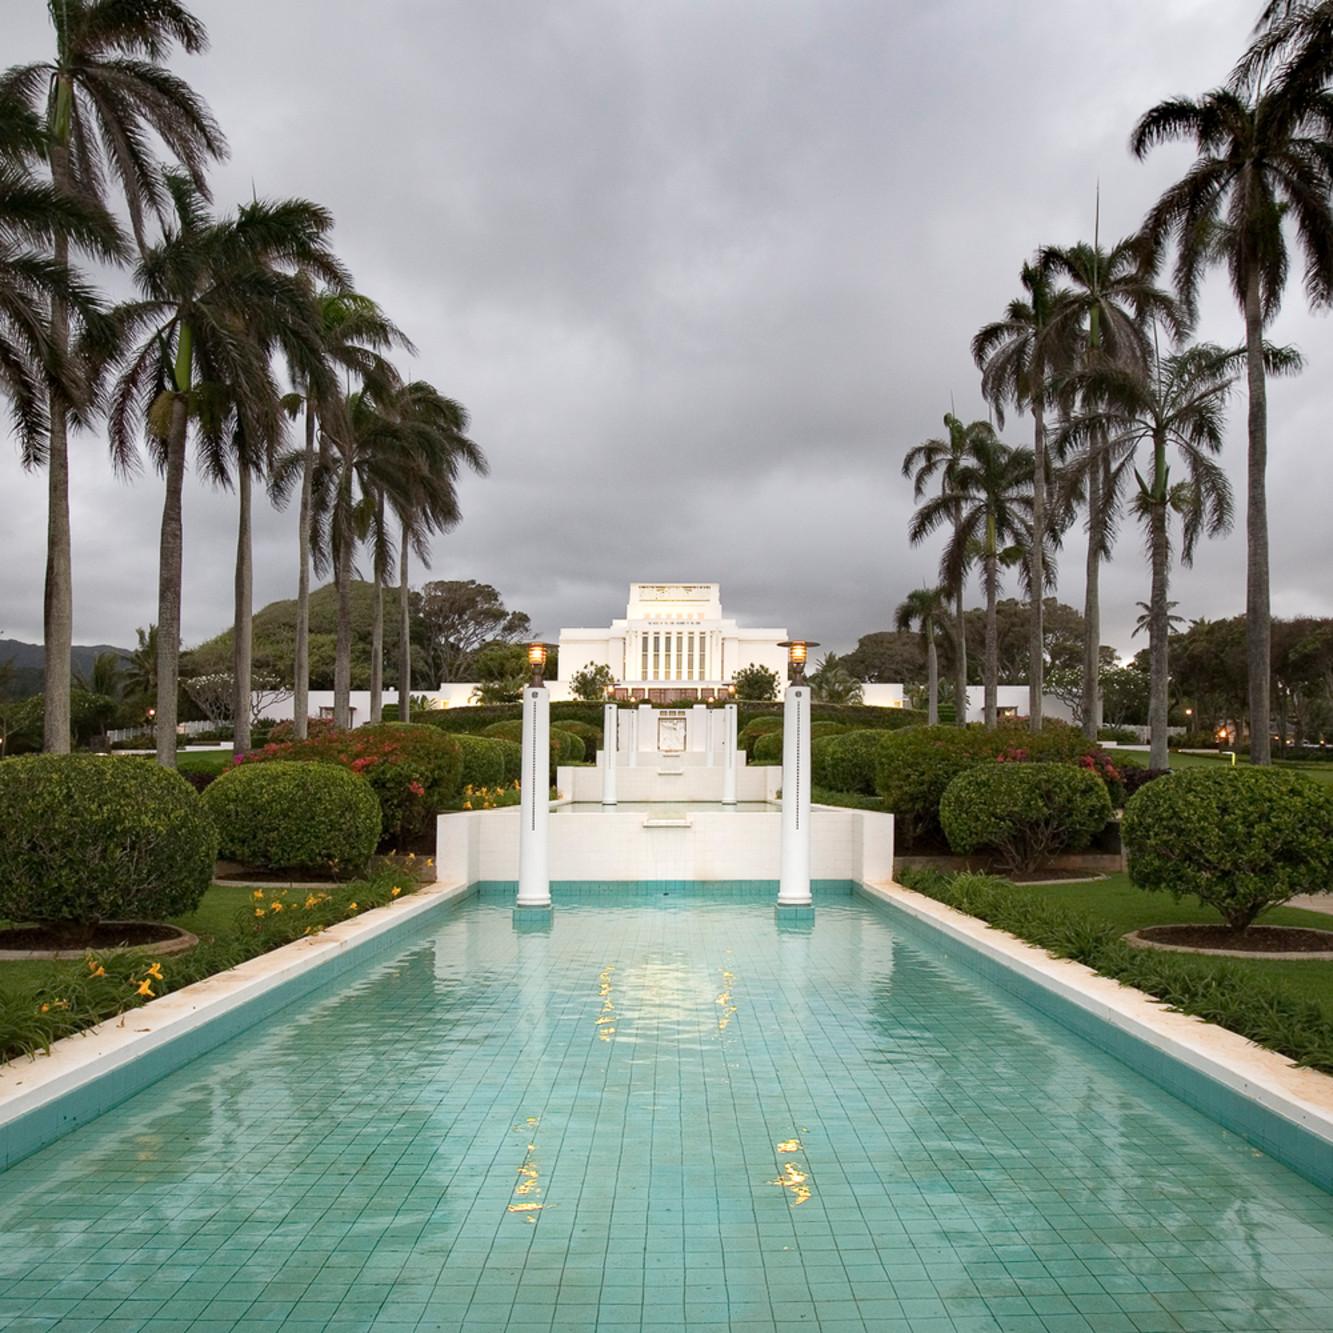 Robert a boyd laie hawaii temple stormy sky fqntdm